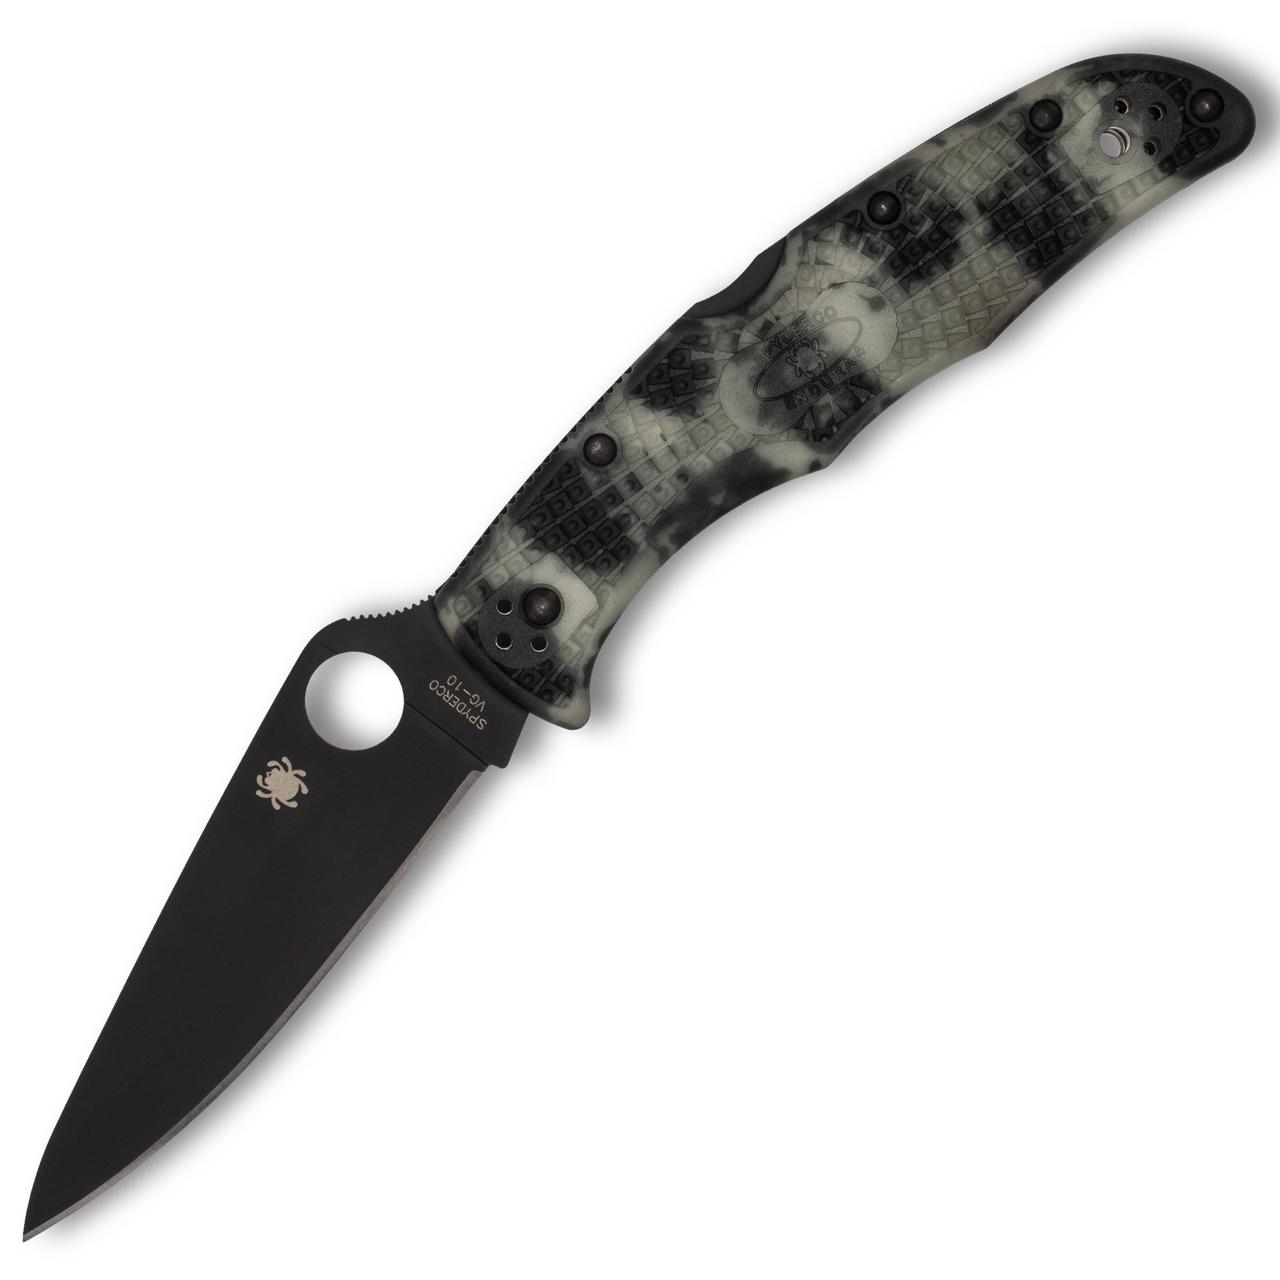 Spyderco C10ZFPGITDBK Endura 4 ZOME Glow in the Dark, Black Blade *Distributor Exclusive*